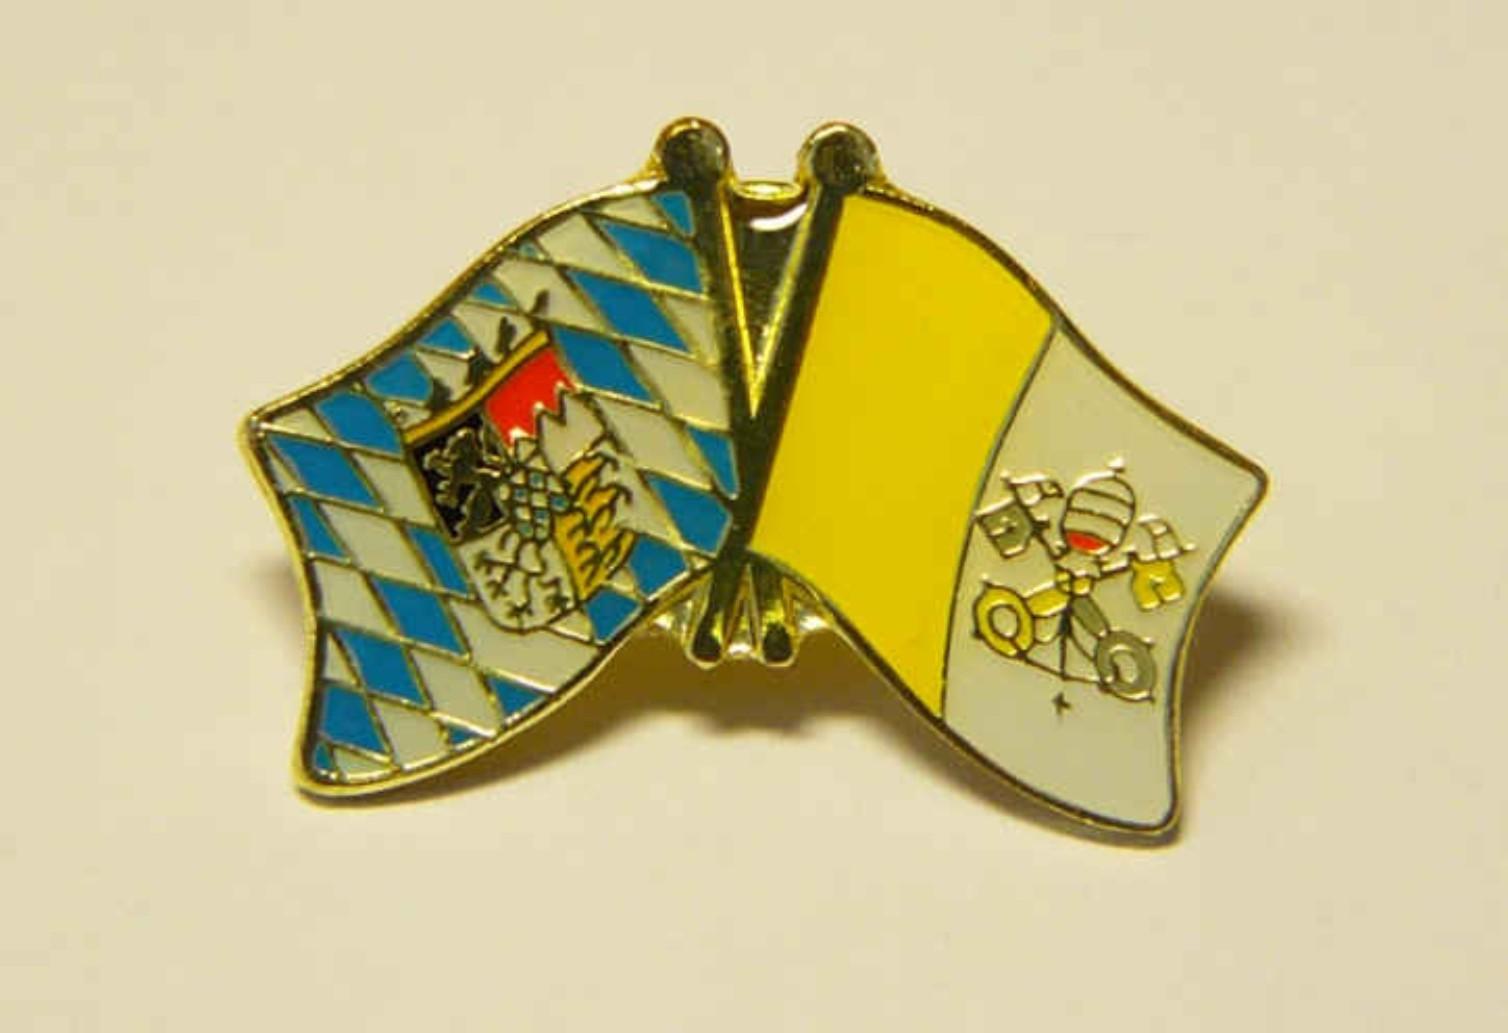 Bayern - Vatikan Freunschaftspin